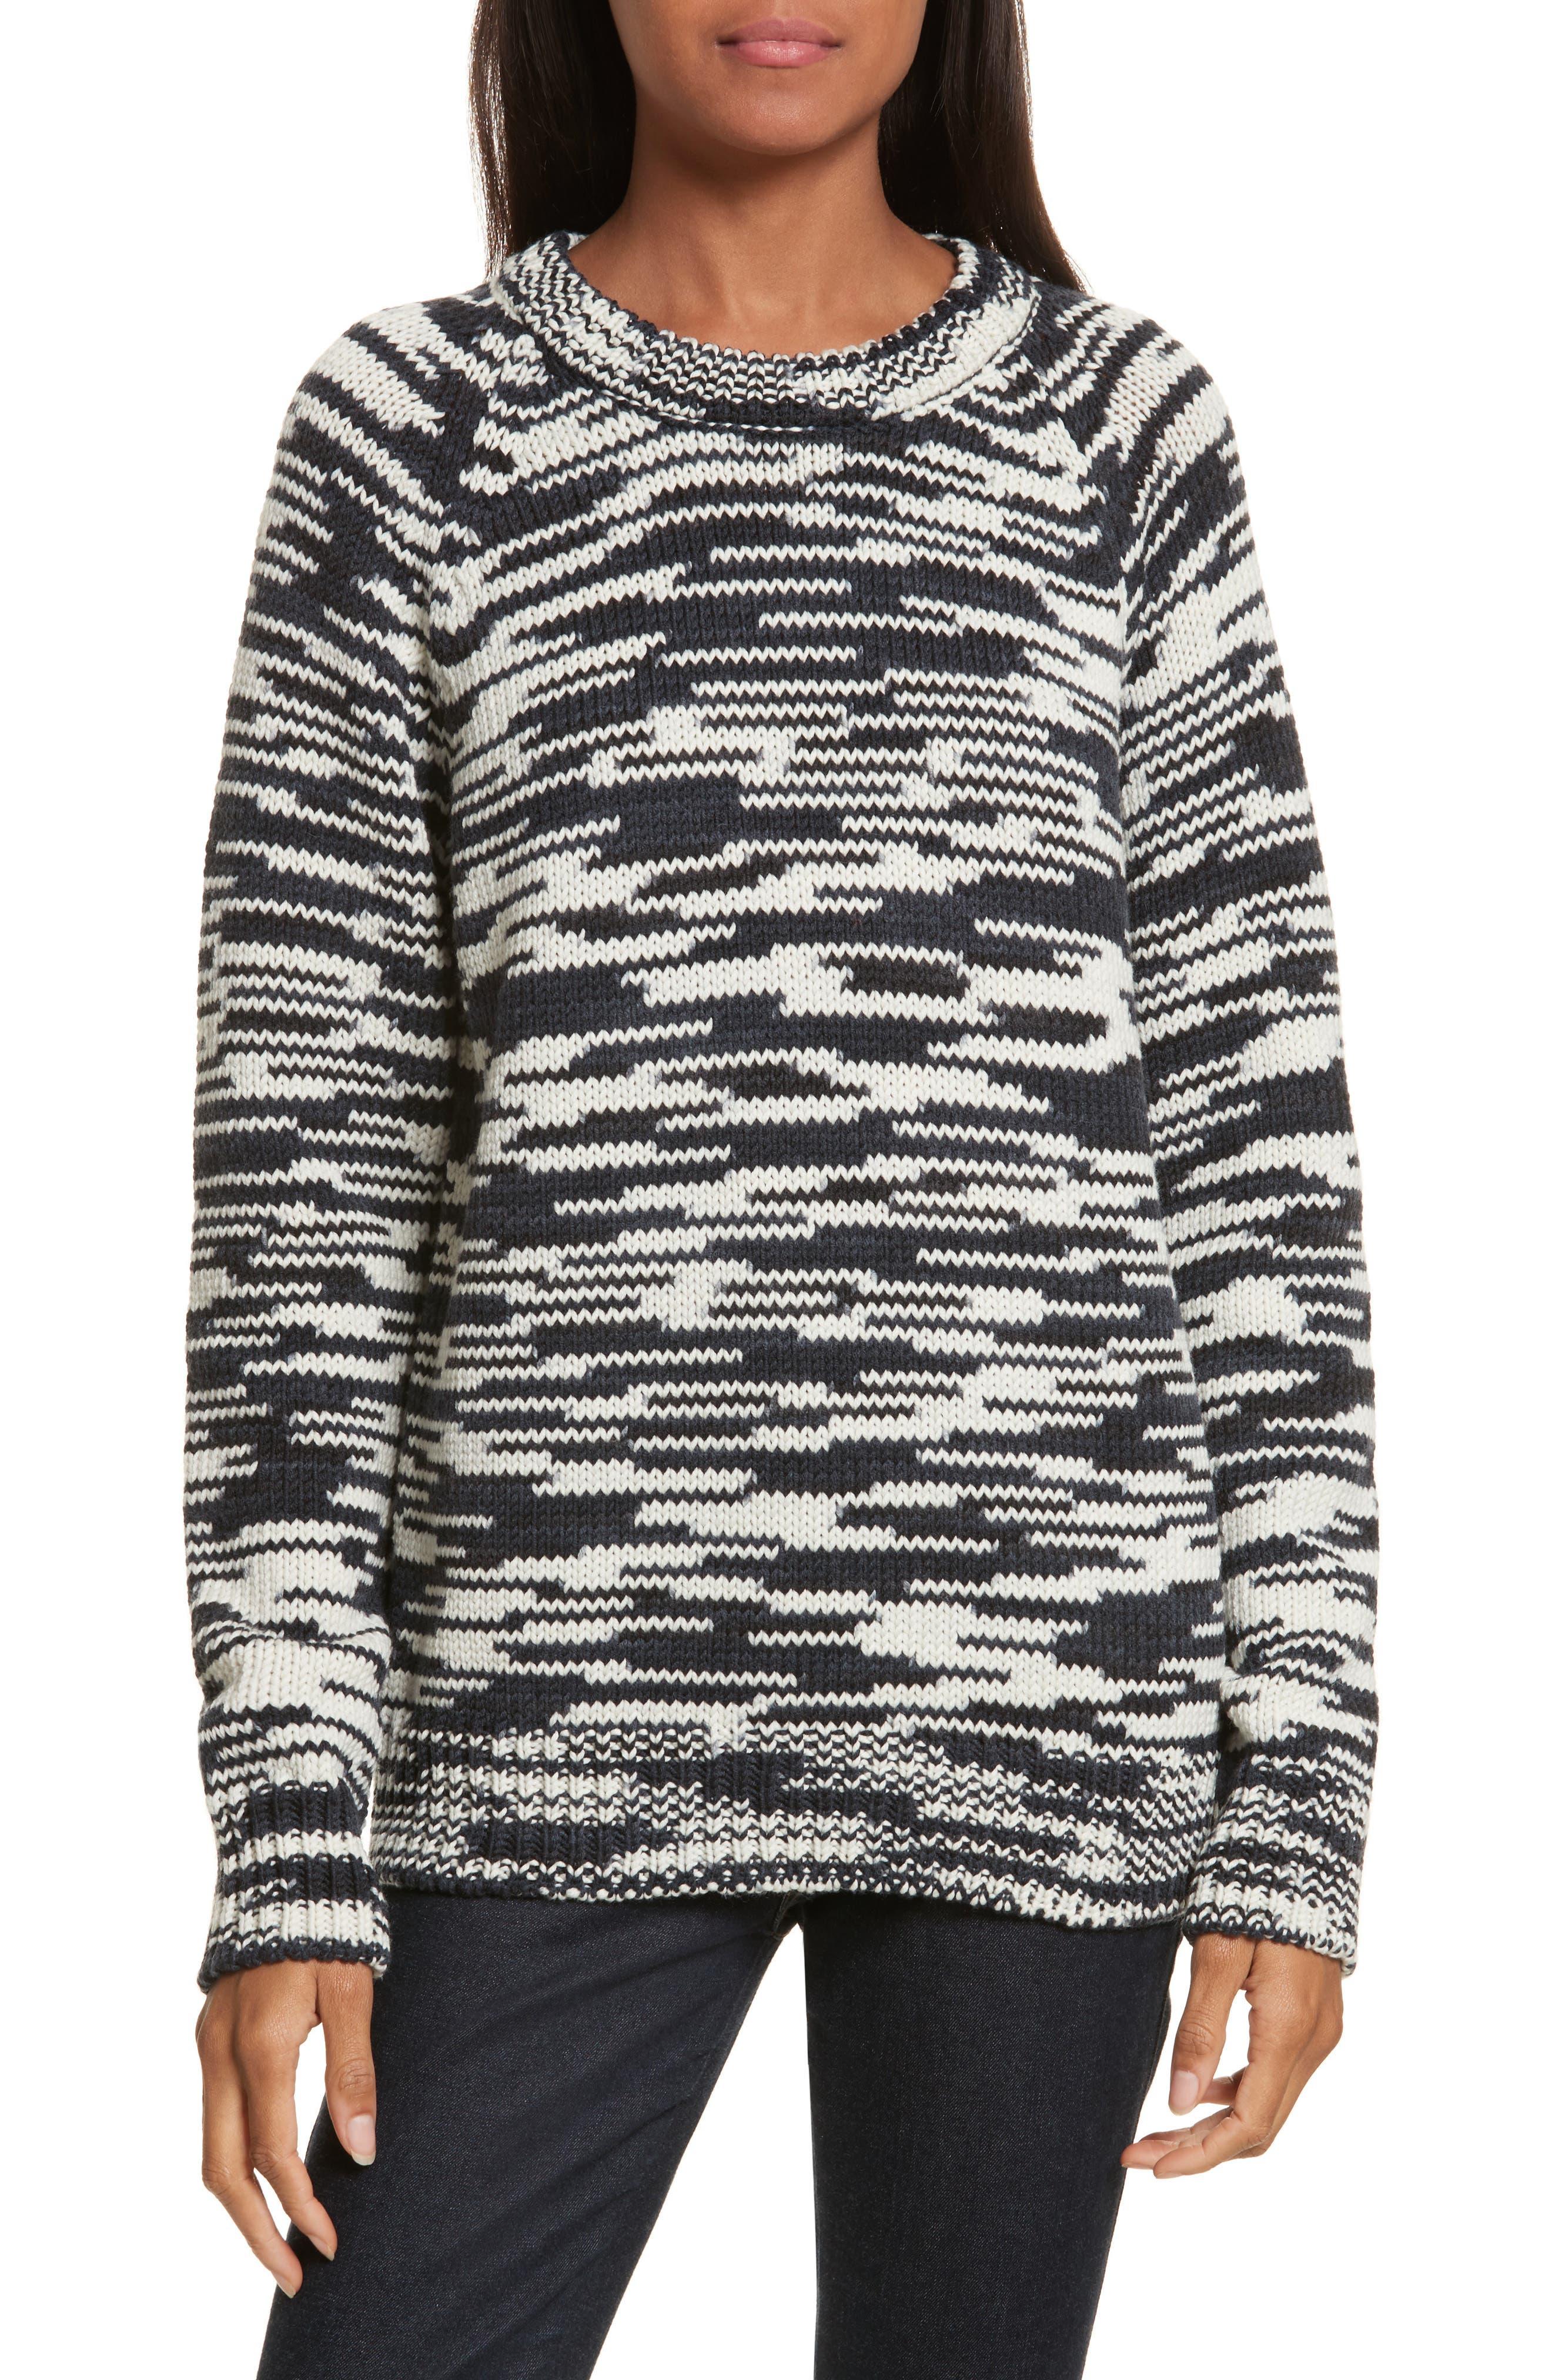 Olivia Merino Wool Sweater,                         Main,                         color, Tory Navy/ New Ivory/ Black